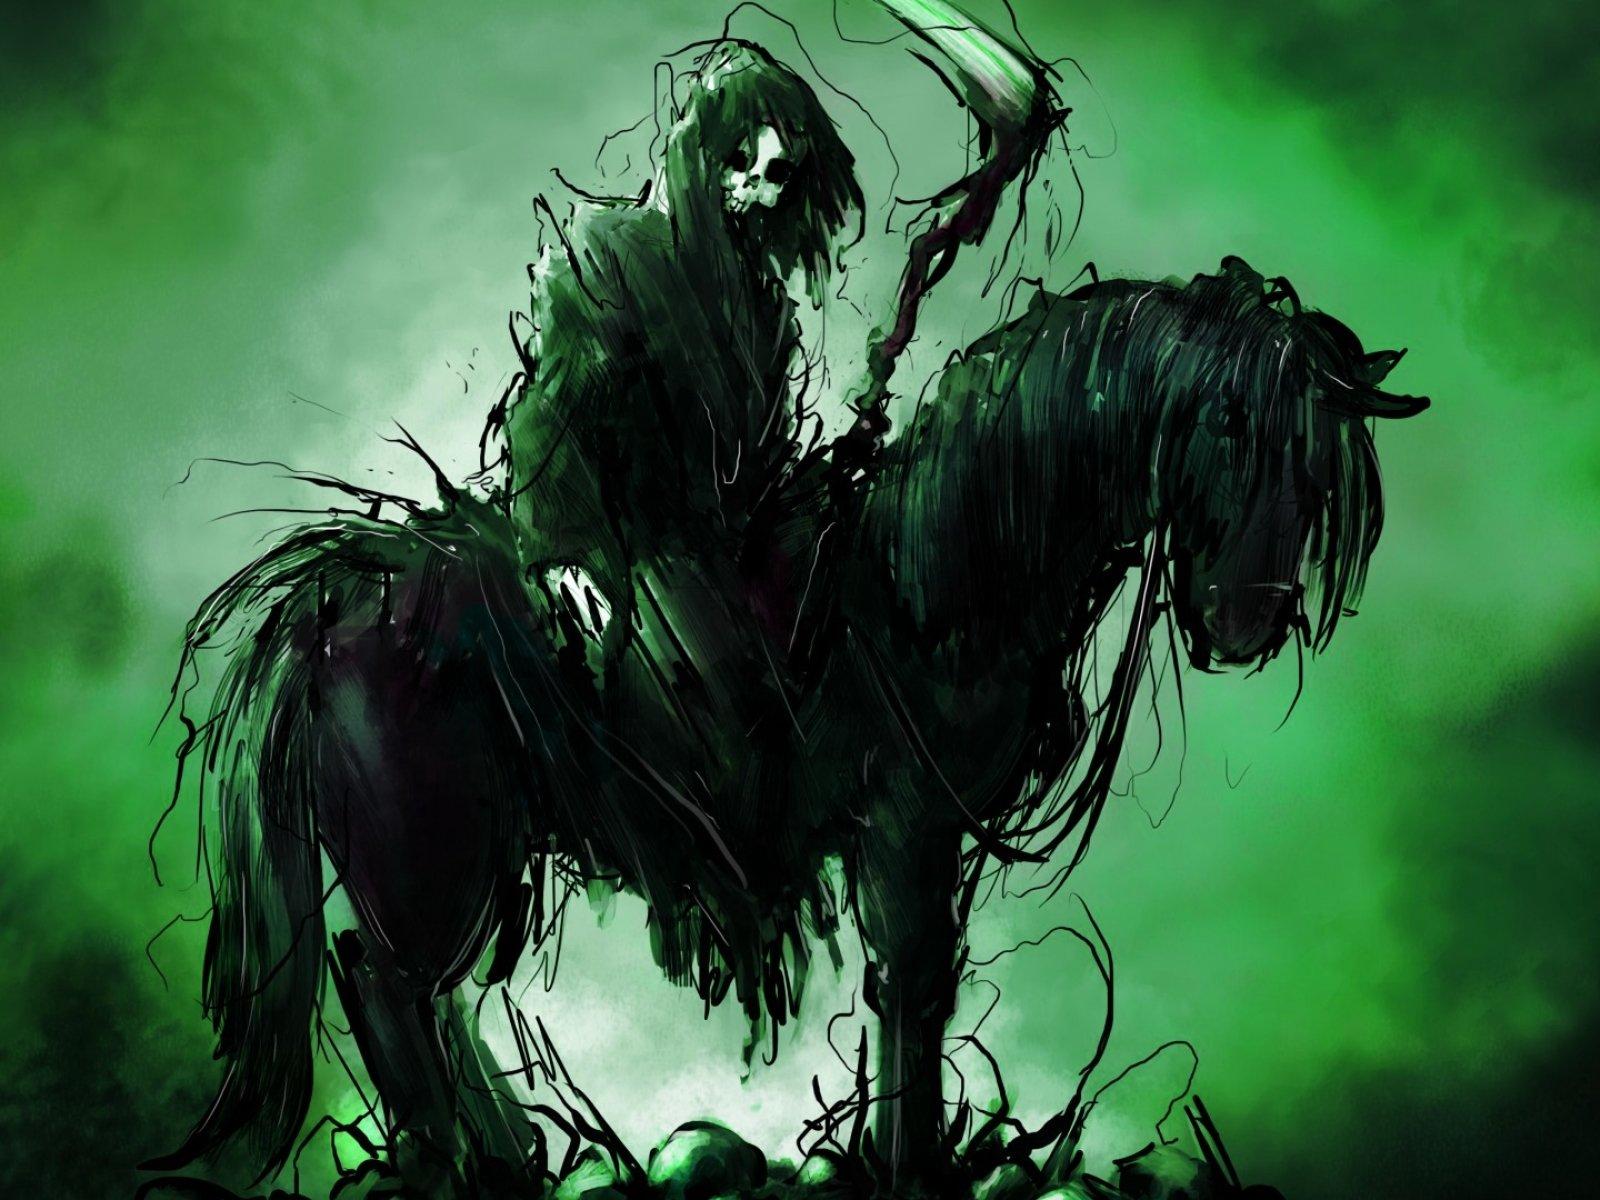 Cool Wallpaper Halloween Horse - 8787eba200e3d800885dc9b29f6ab32e  Pictures_37869.jpg